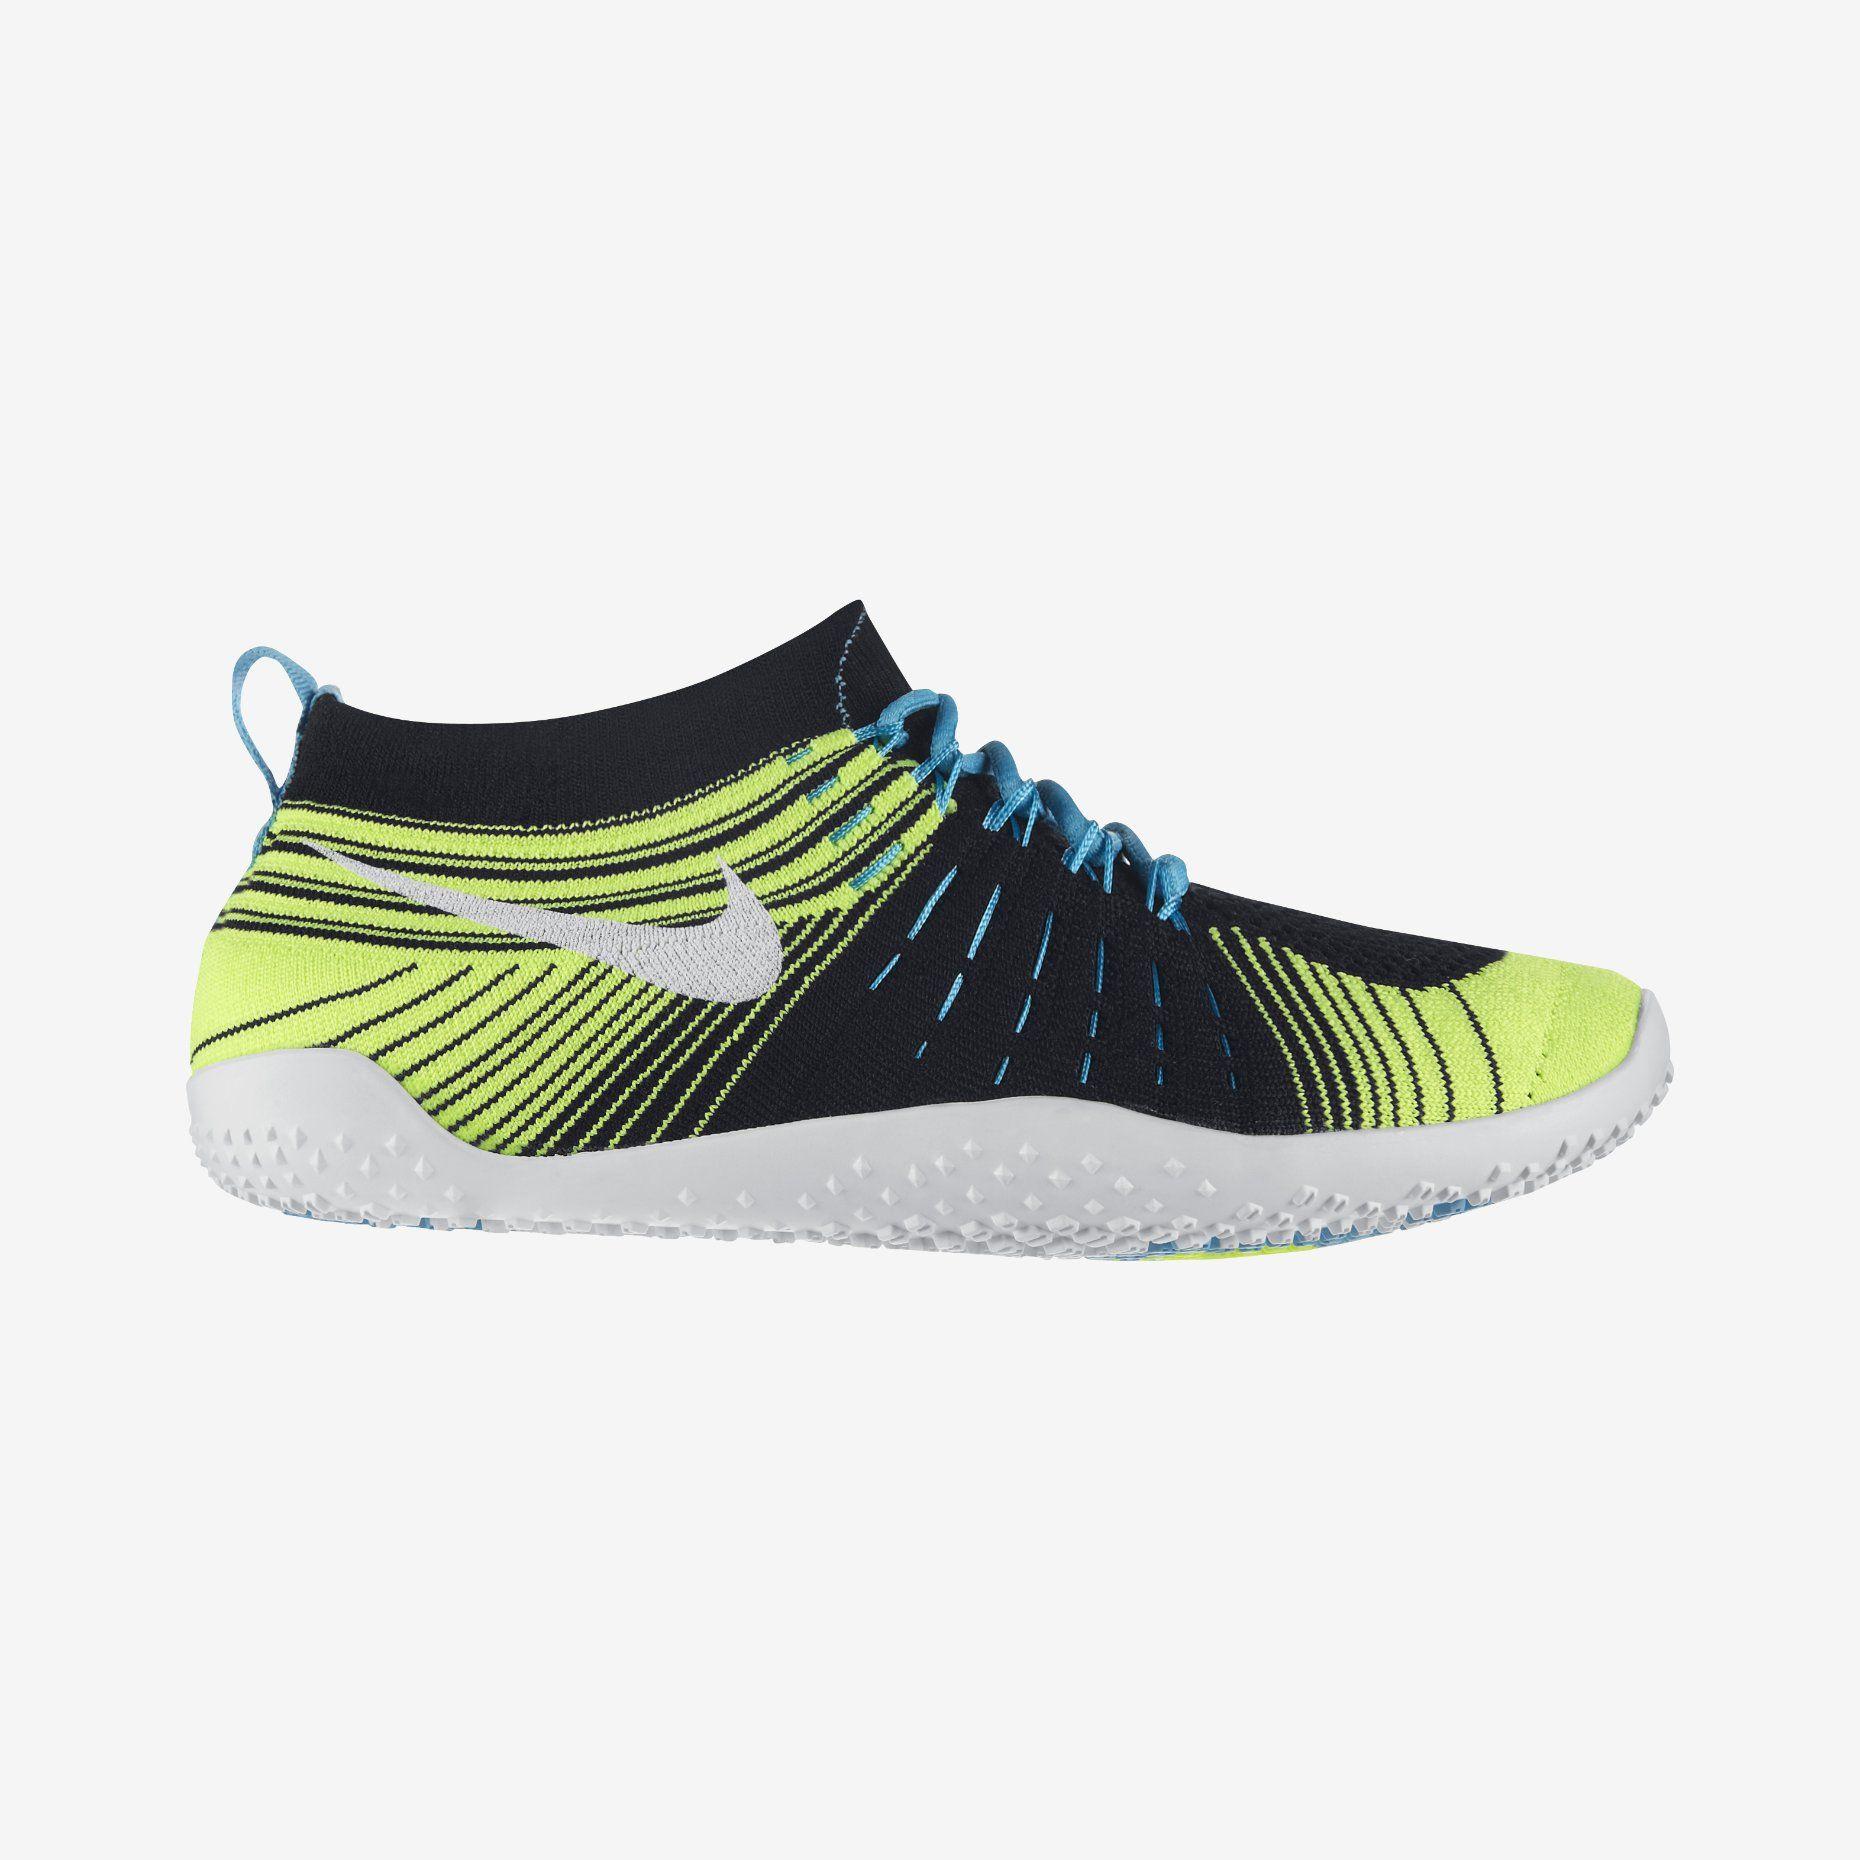 ed42265c6a6b Nike Free Hyperfeel Cross Elite Women s Training Shoe. Nike Store  175